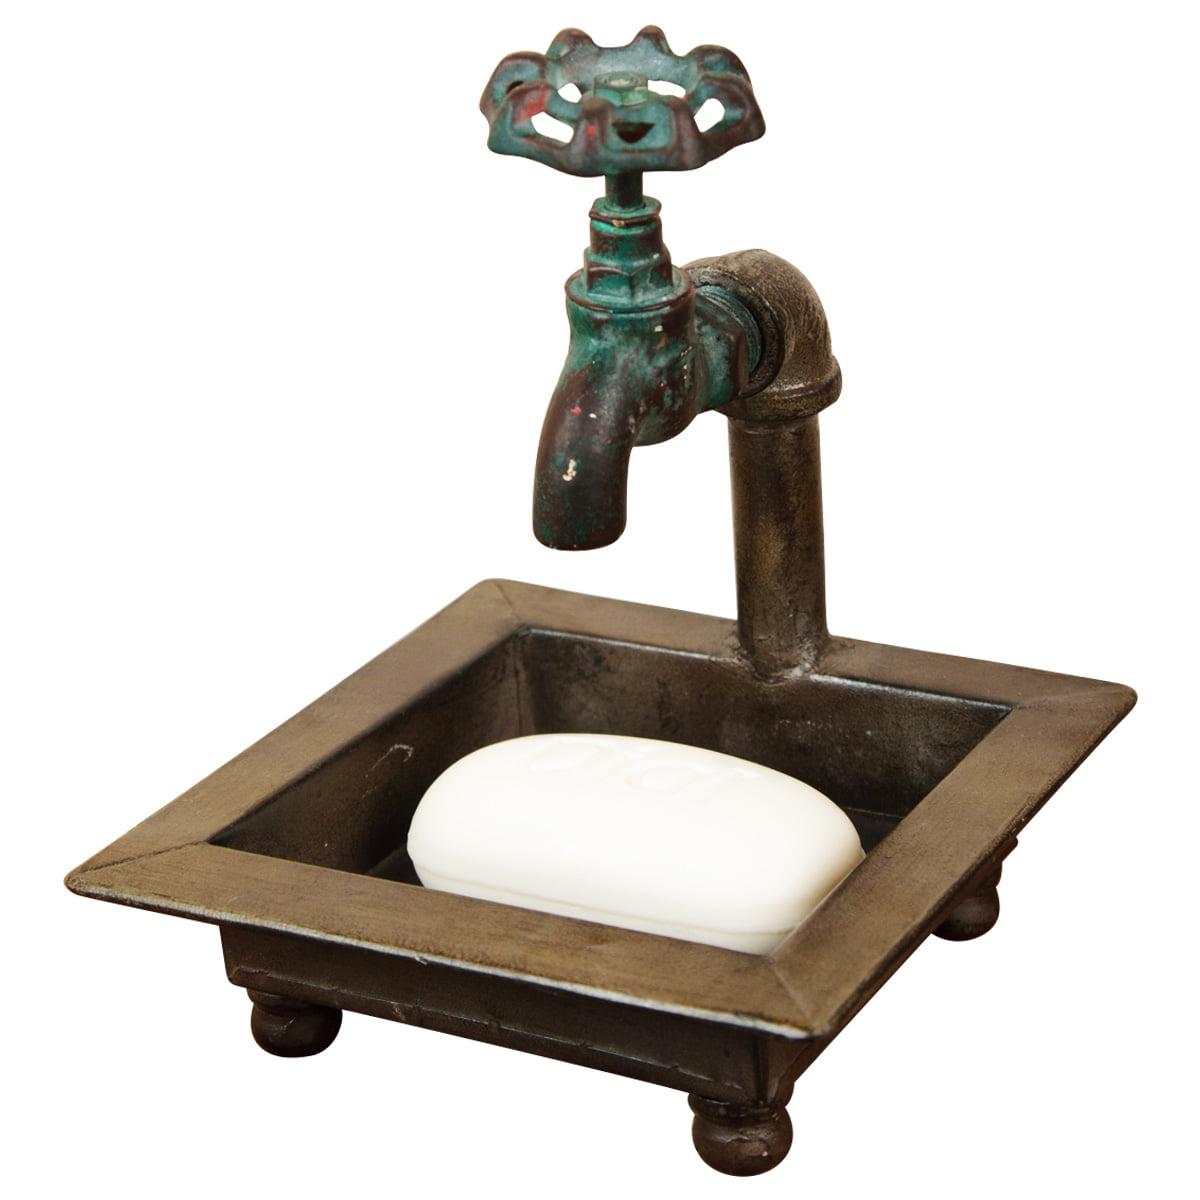 Farmhouse Spigot Soap And Towel Holder Bathroom Rustic Decor